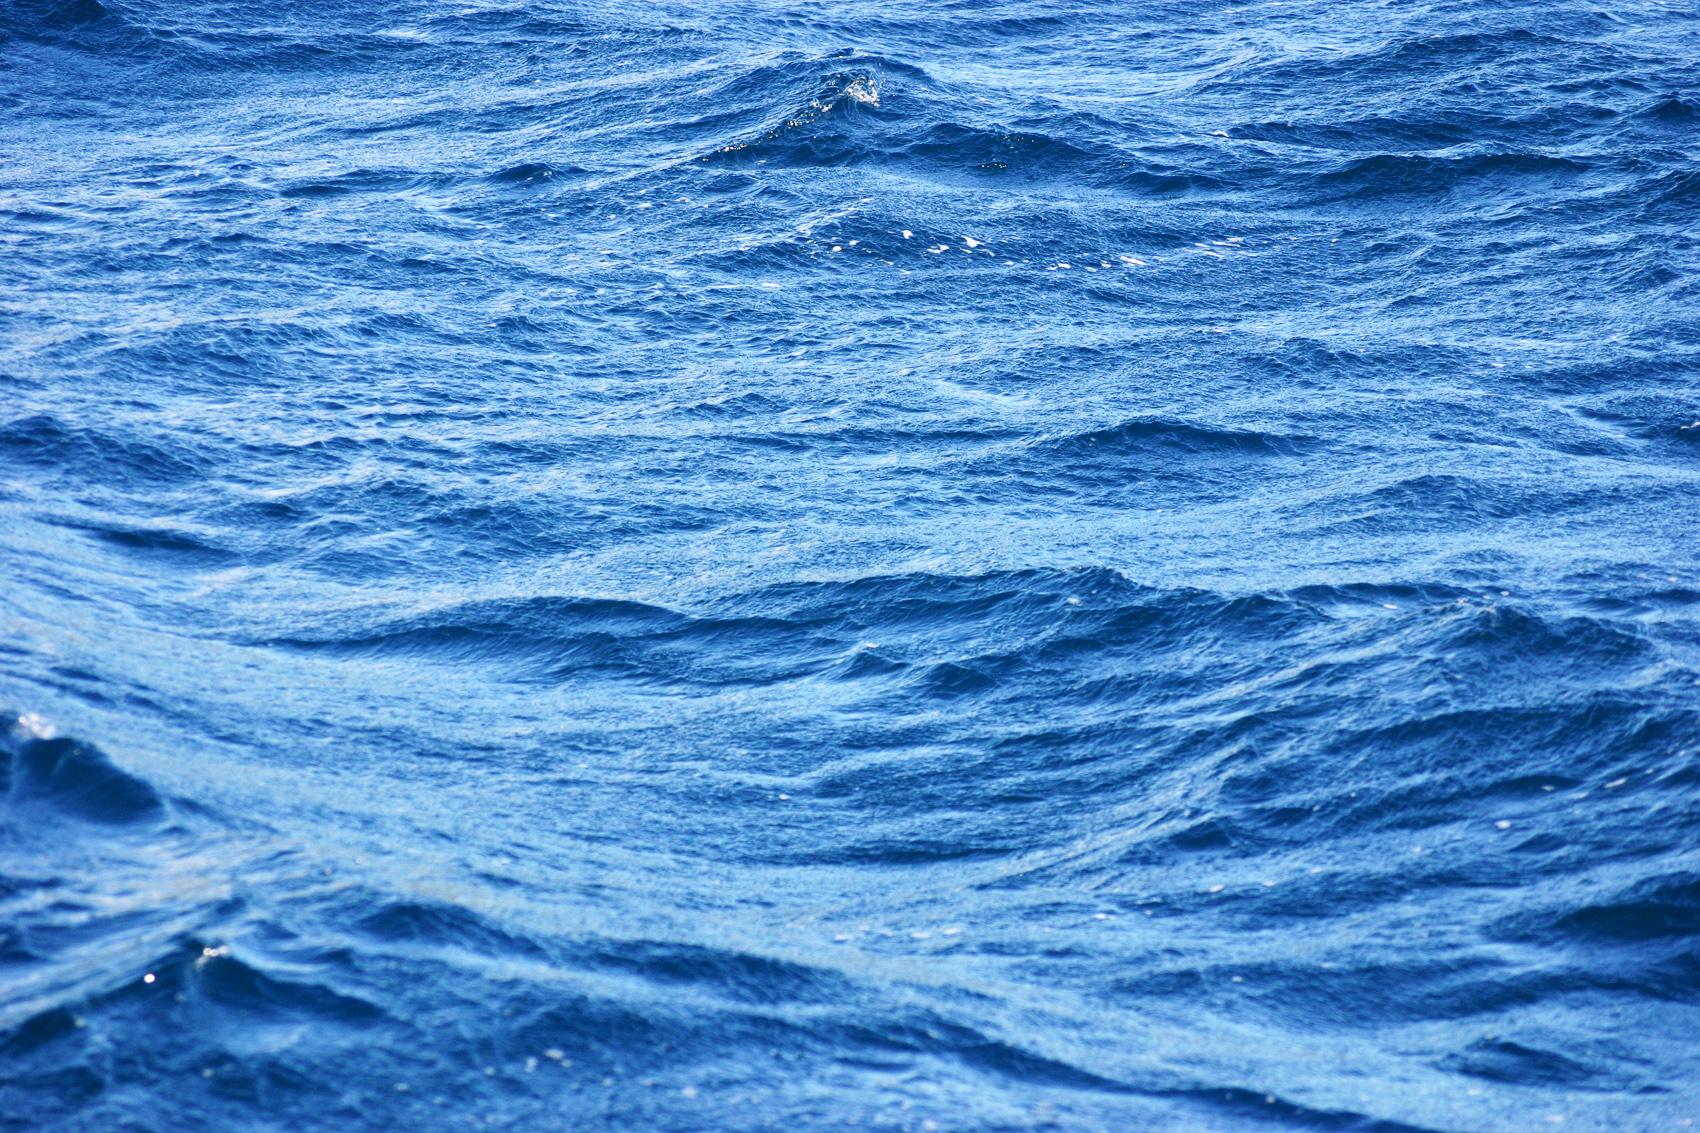 Blue water, Blue, Ocean, Sea, Water, HQ Photo